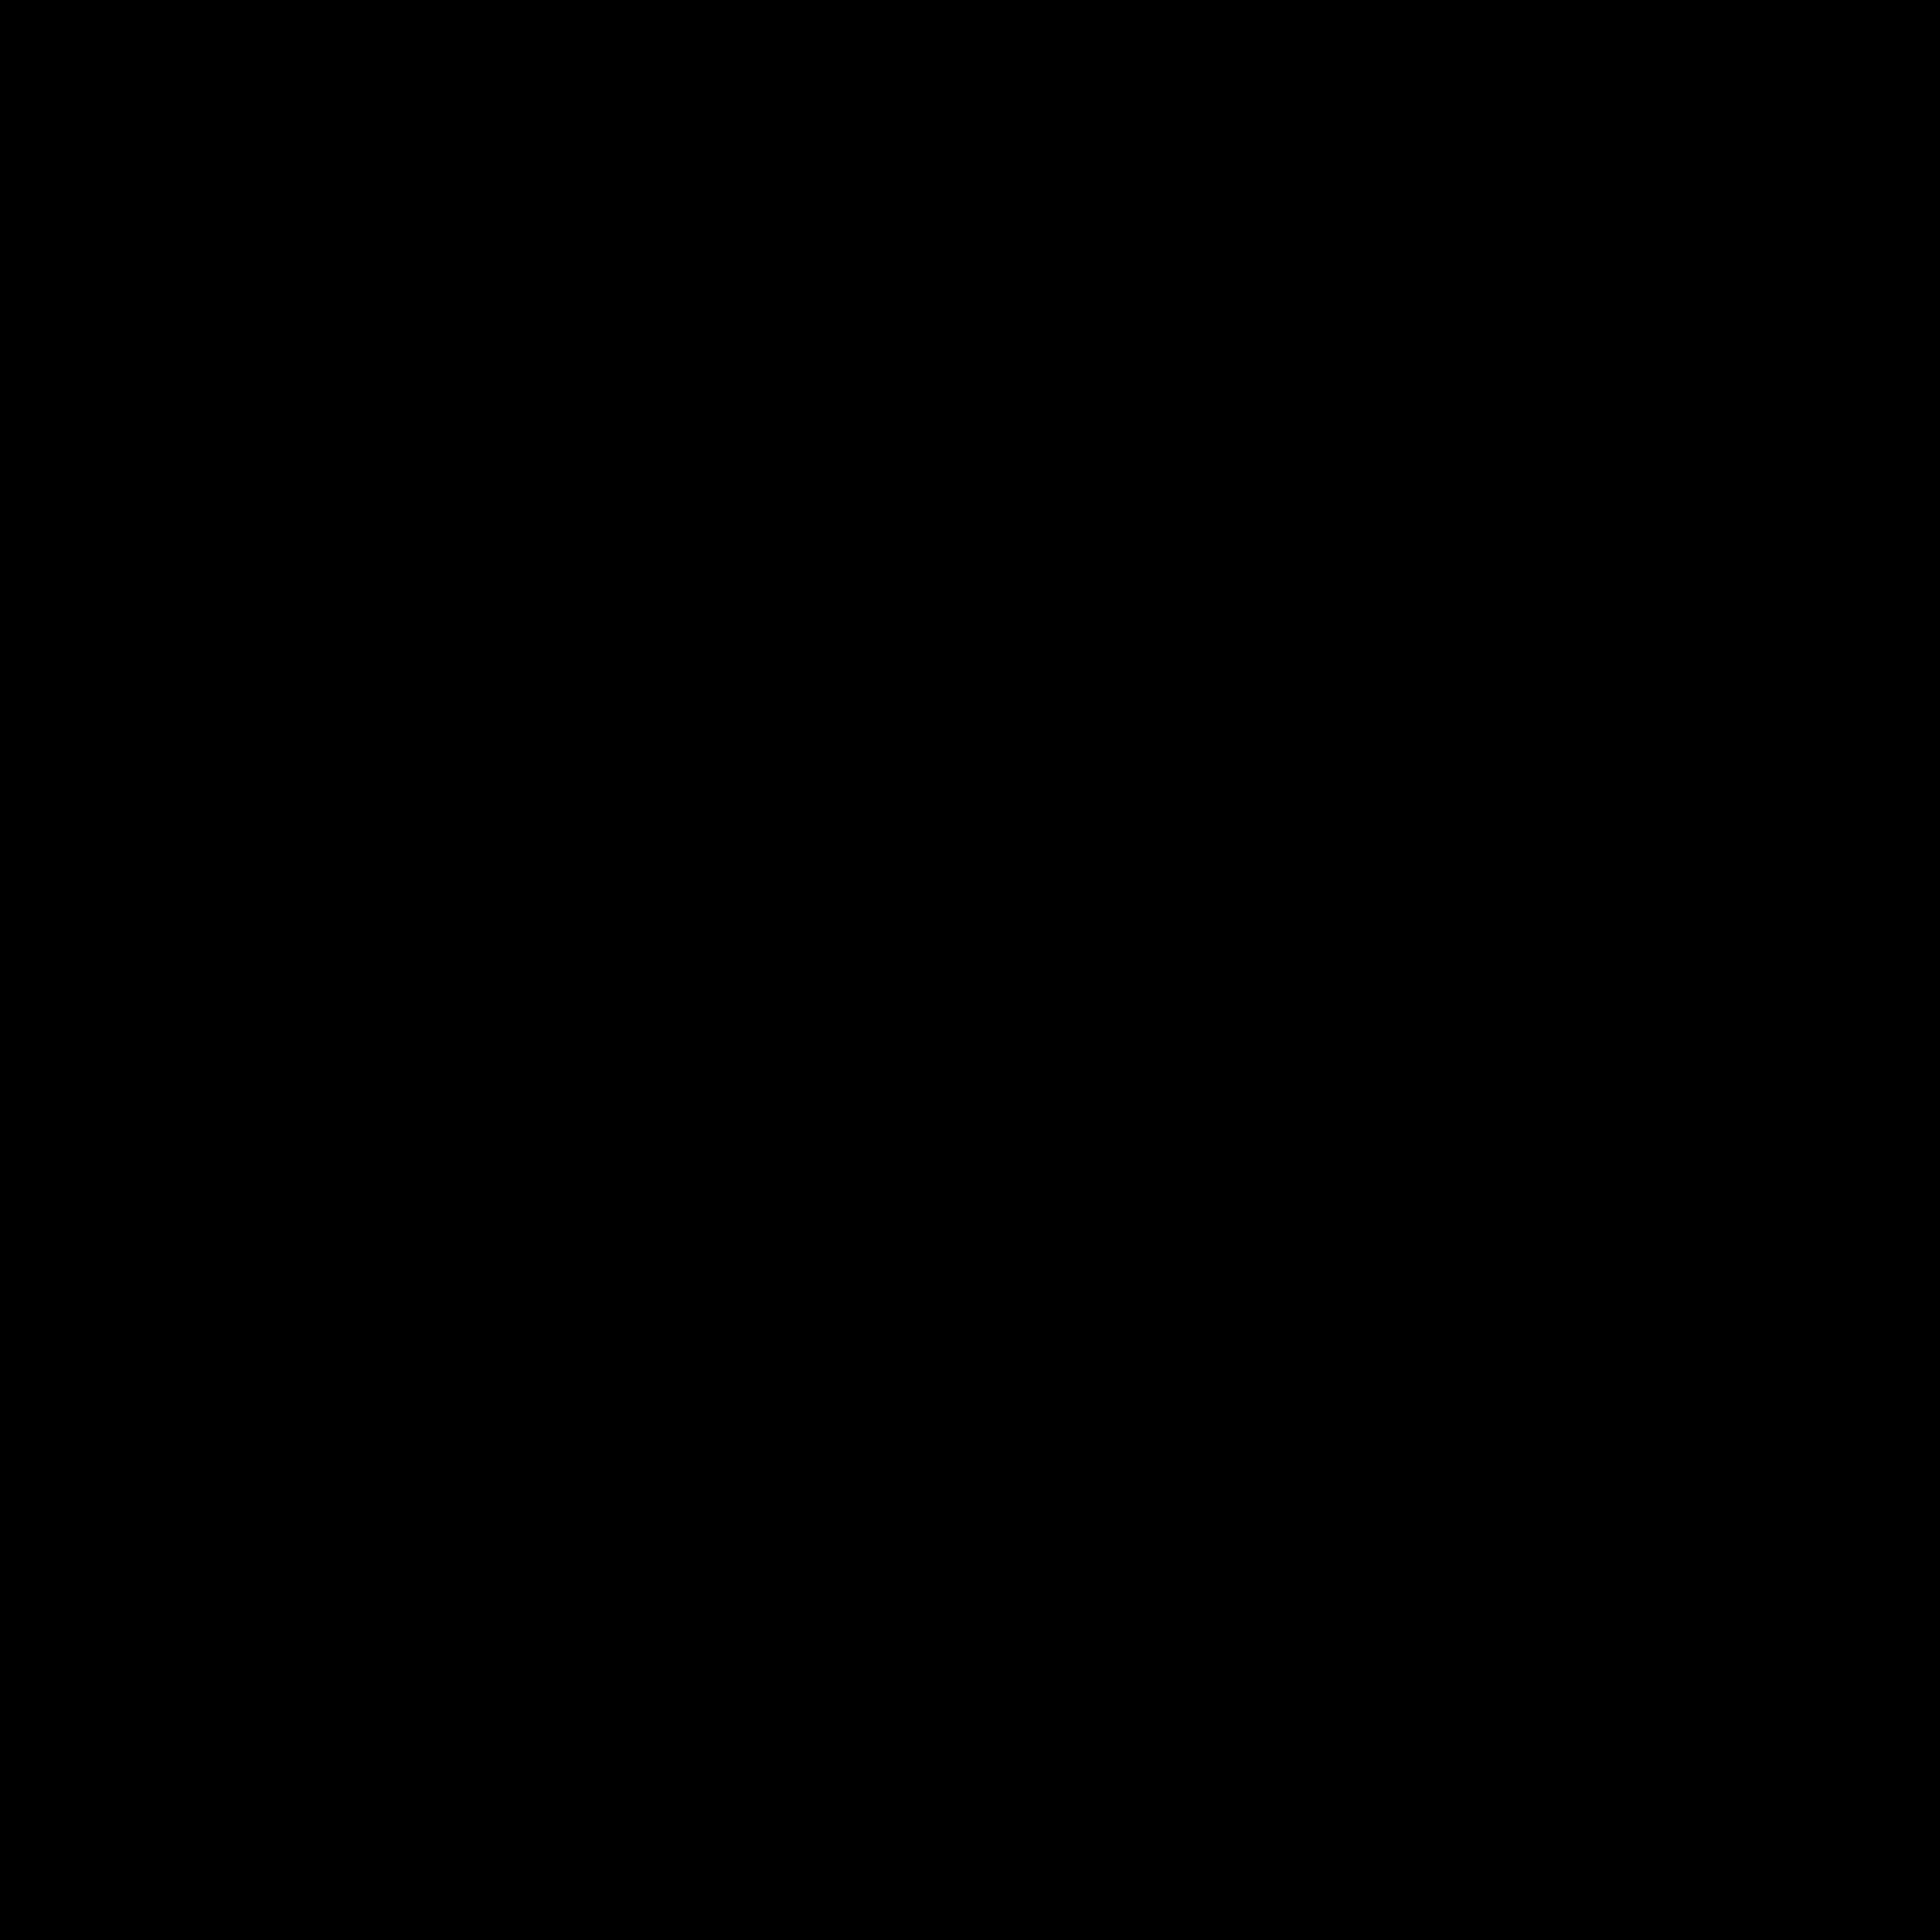 clipart gps icon